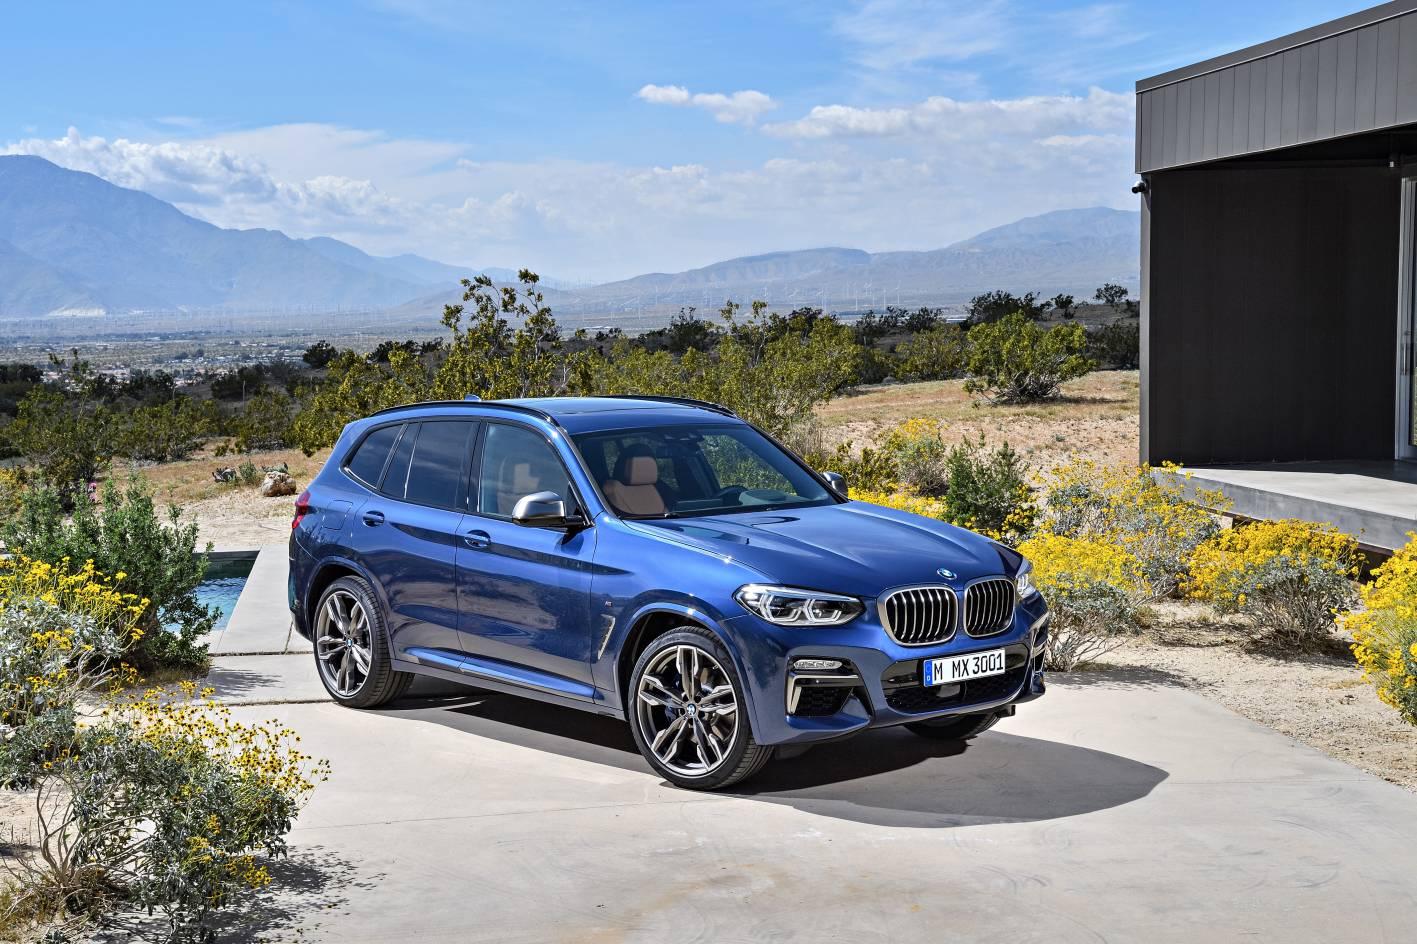 BMW X3 SUV - 2